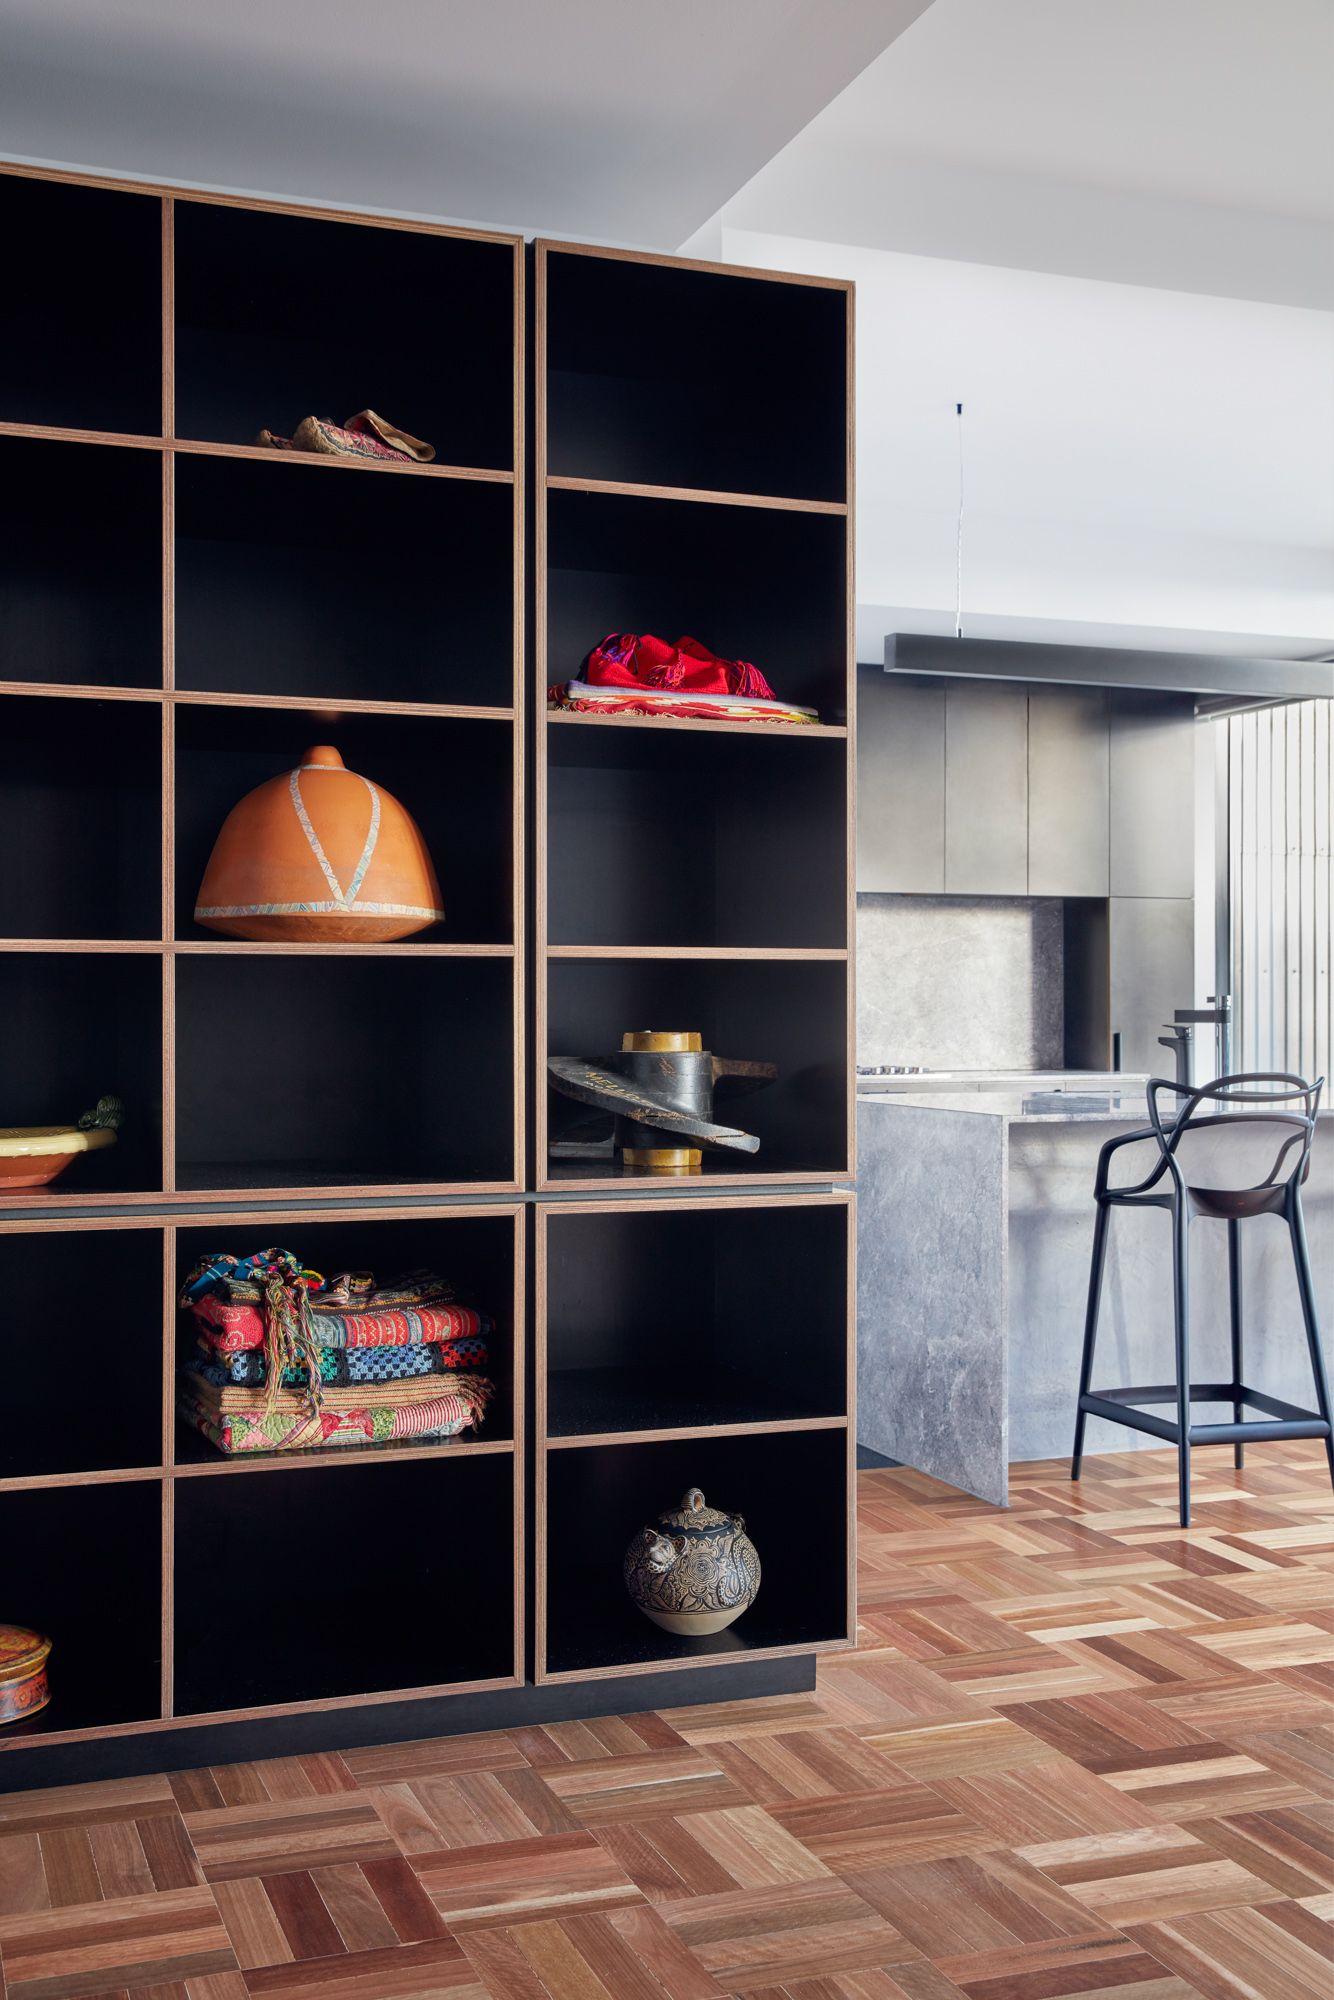 Gallery Of Queen Street Apartment By Alana Cooke Local Australian Architecture Interio Interior Architecture Design Diy Hanging Shelves Interior Architecture